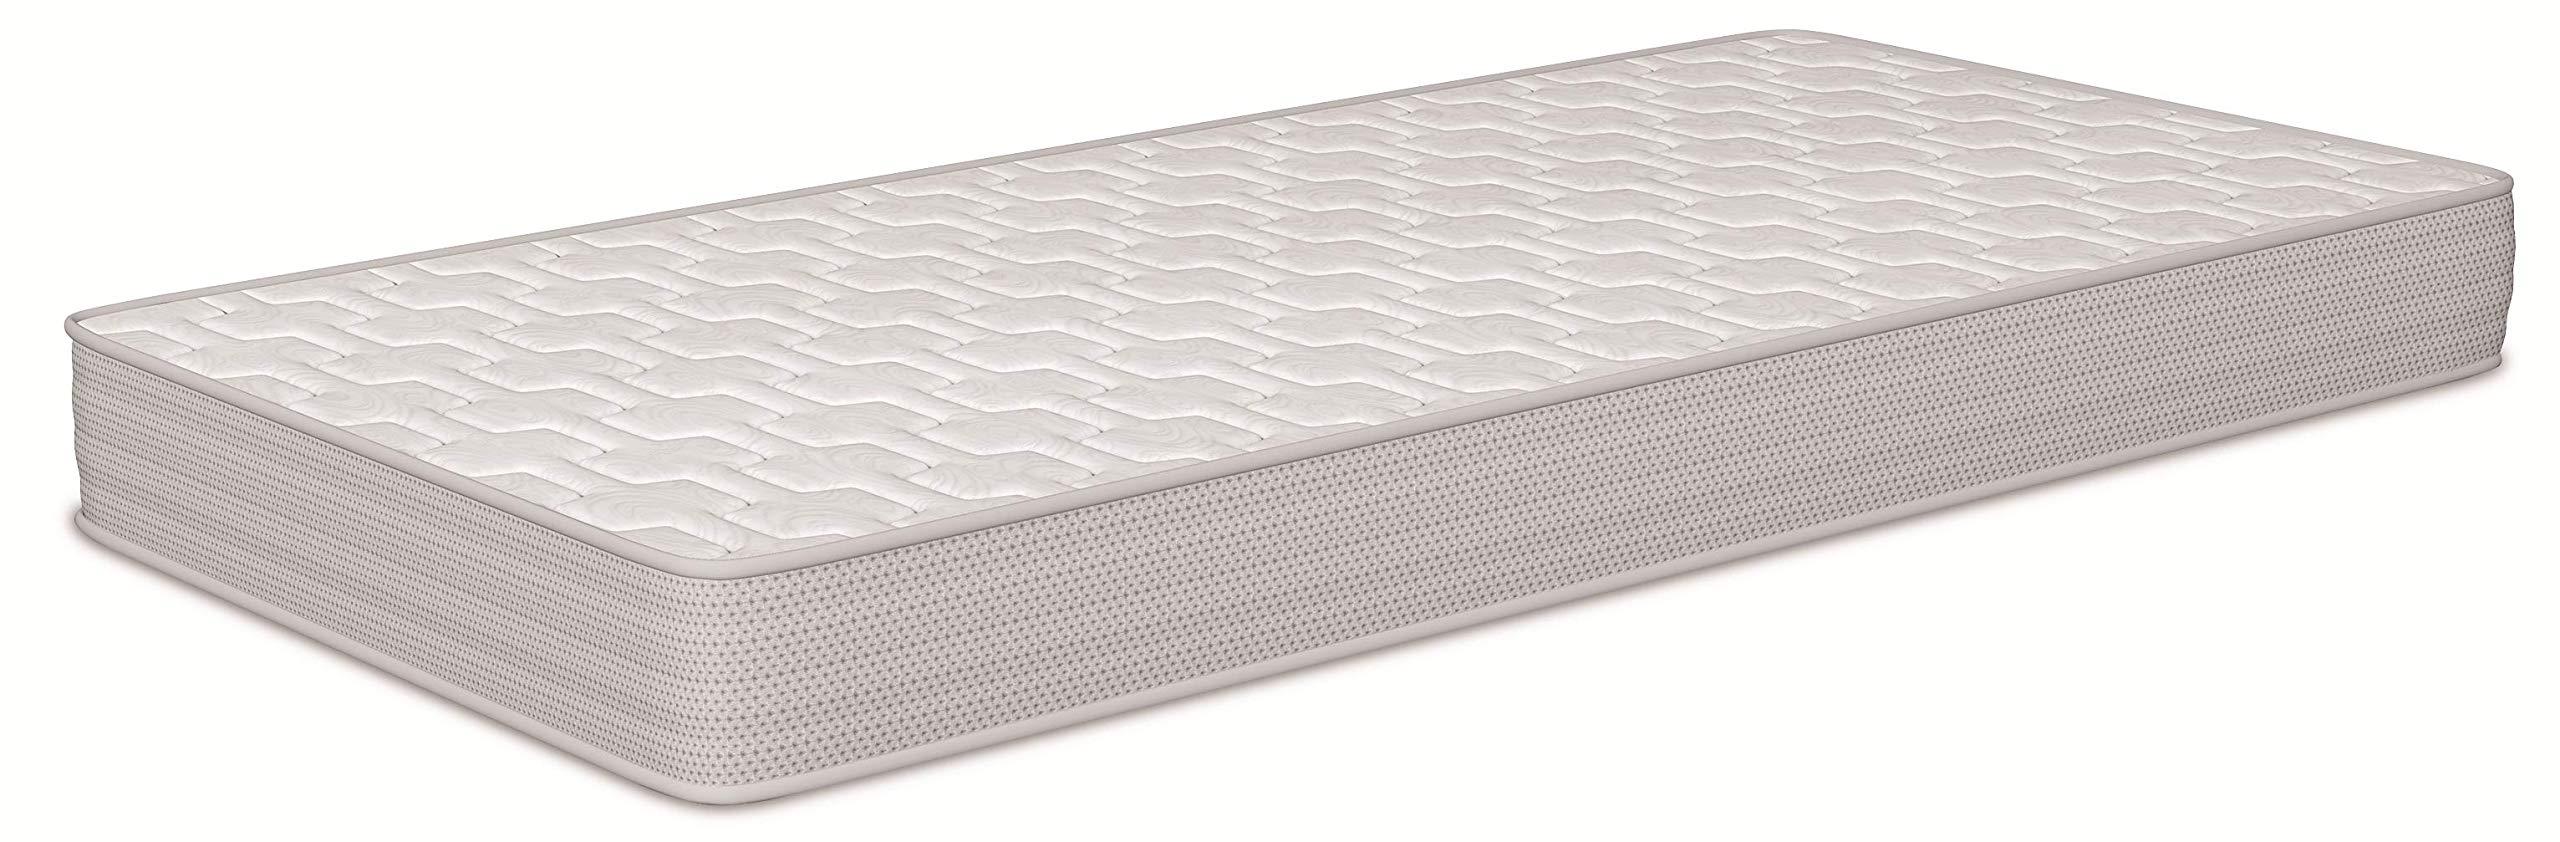 Naturalia - Colchón cuna baby memory visco, talla 140x70cm, color blanco / gris product